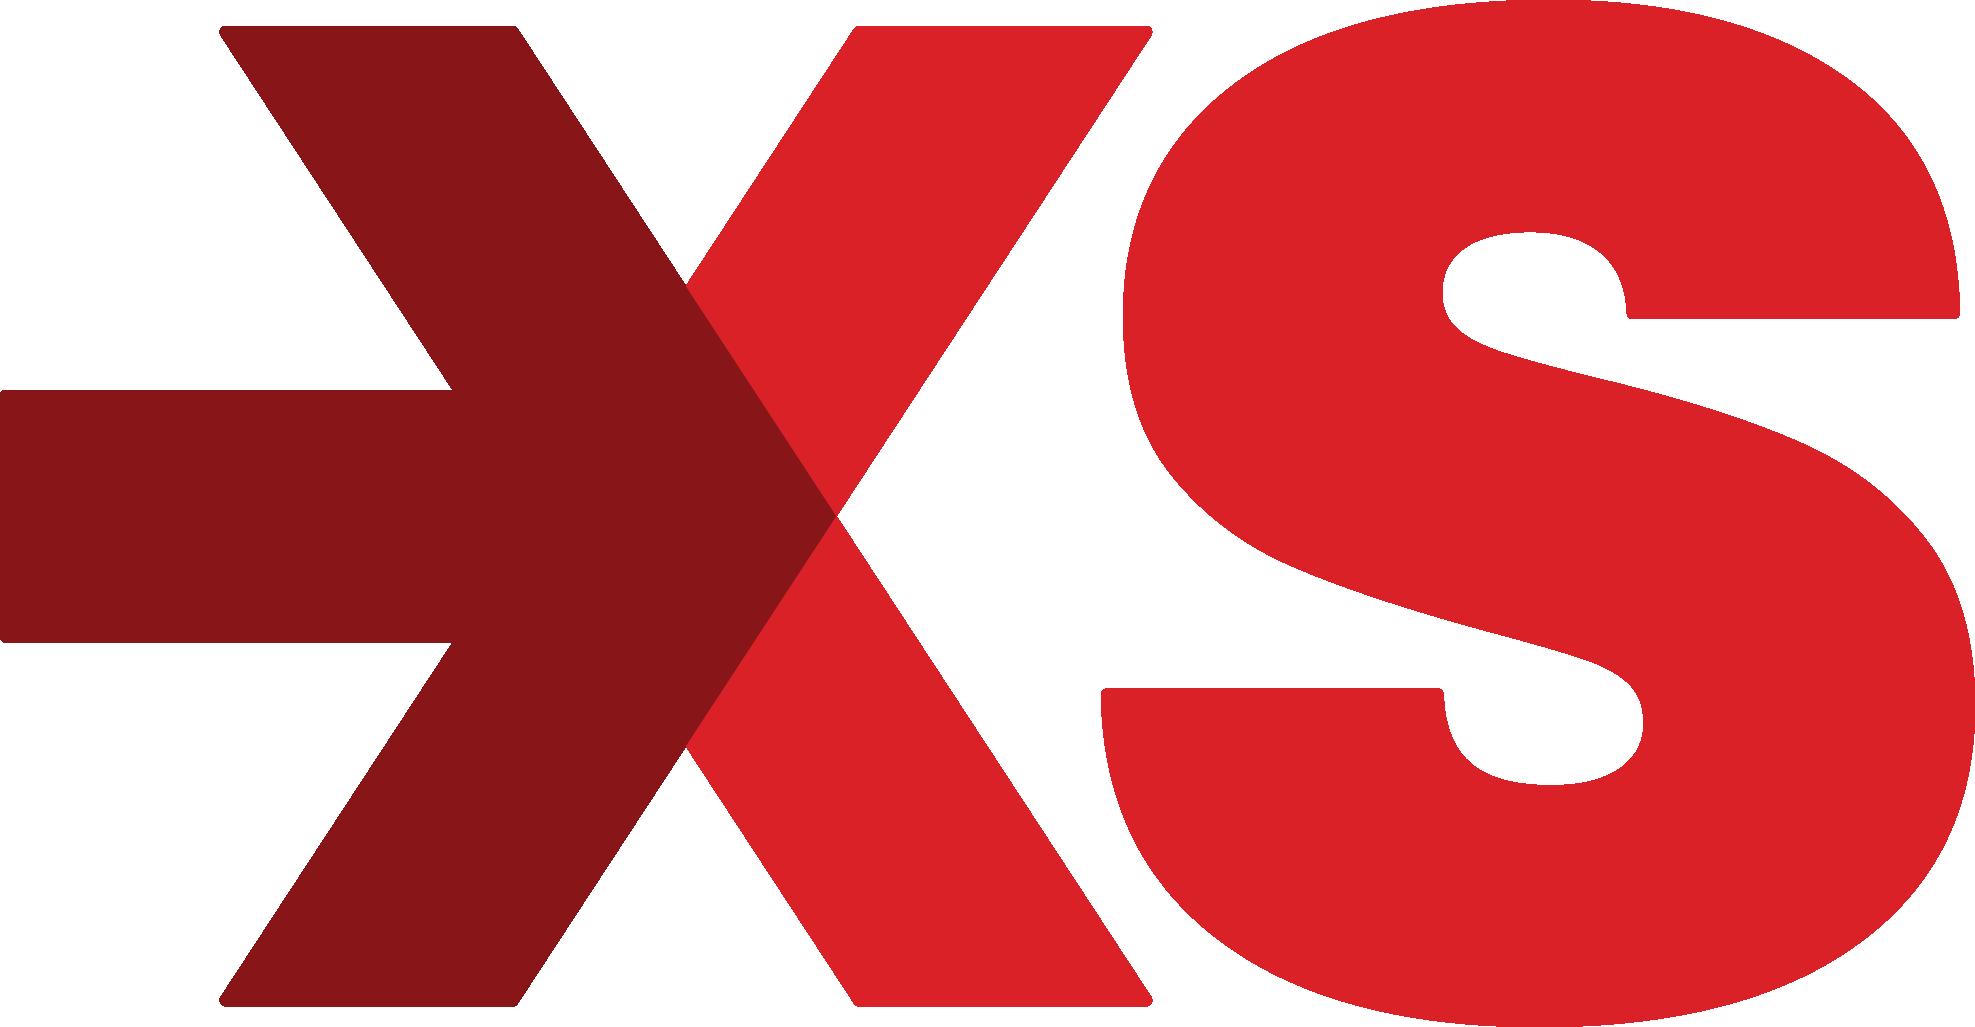 XS_Merki-1